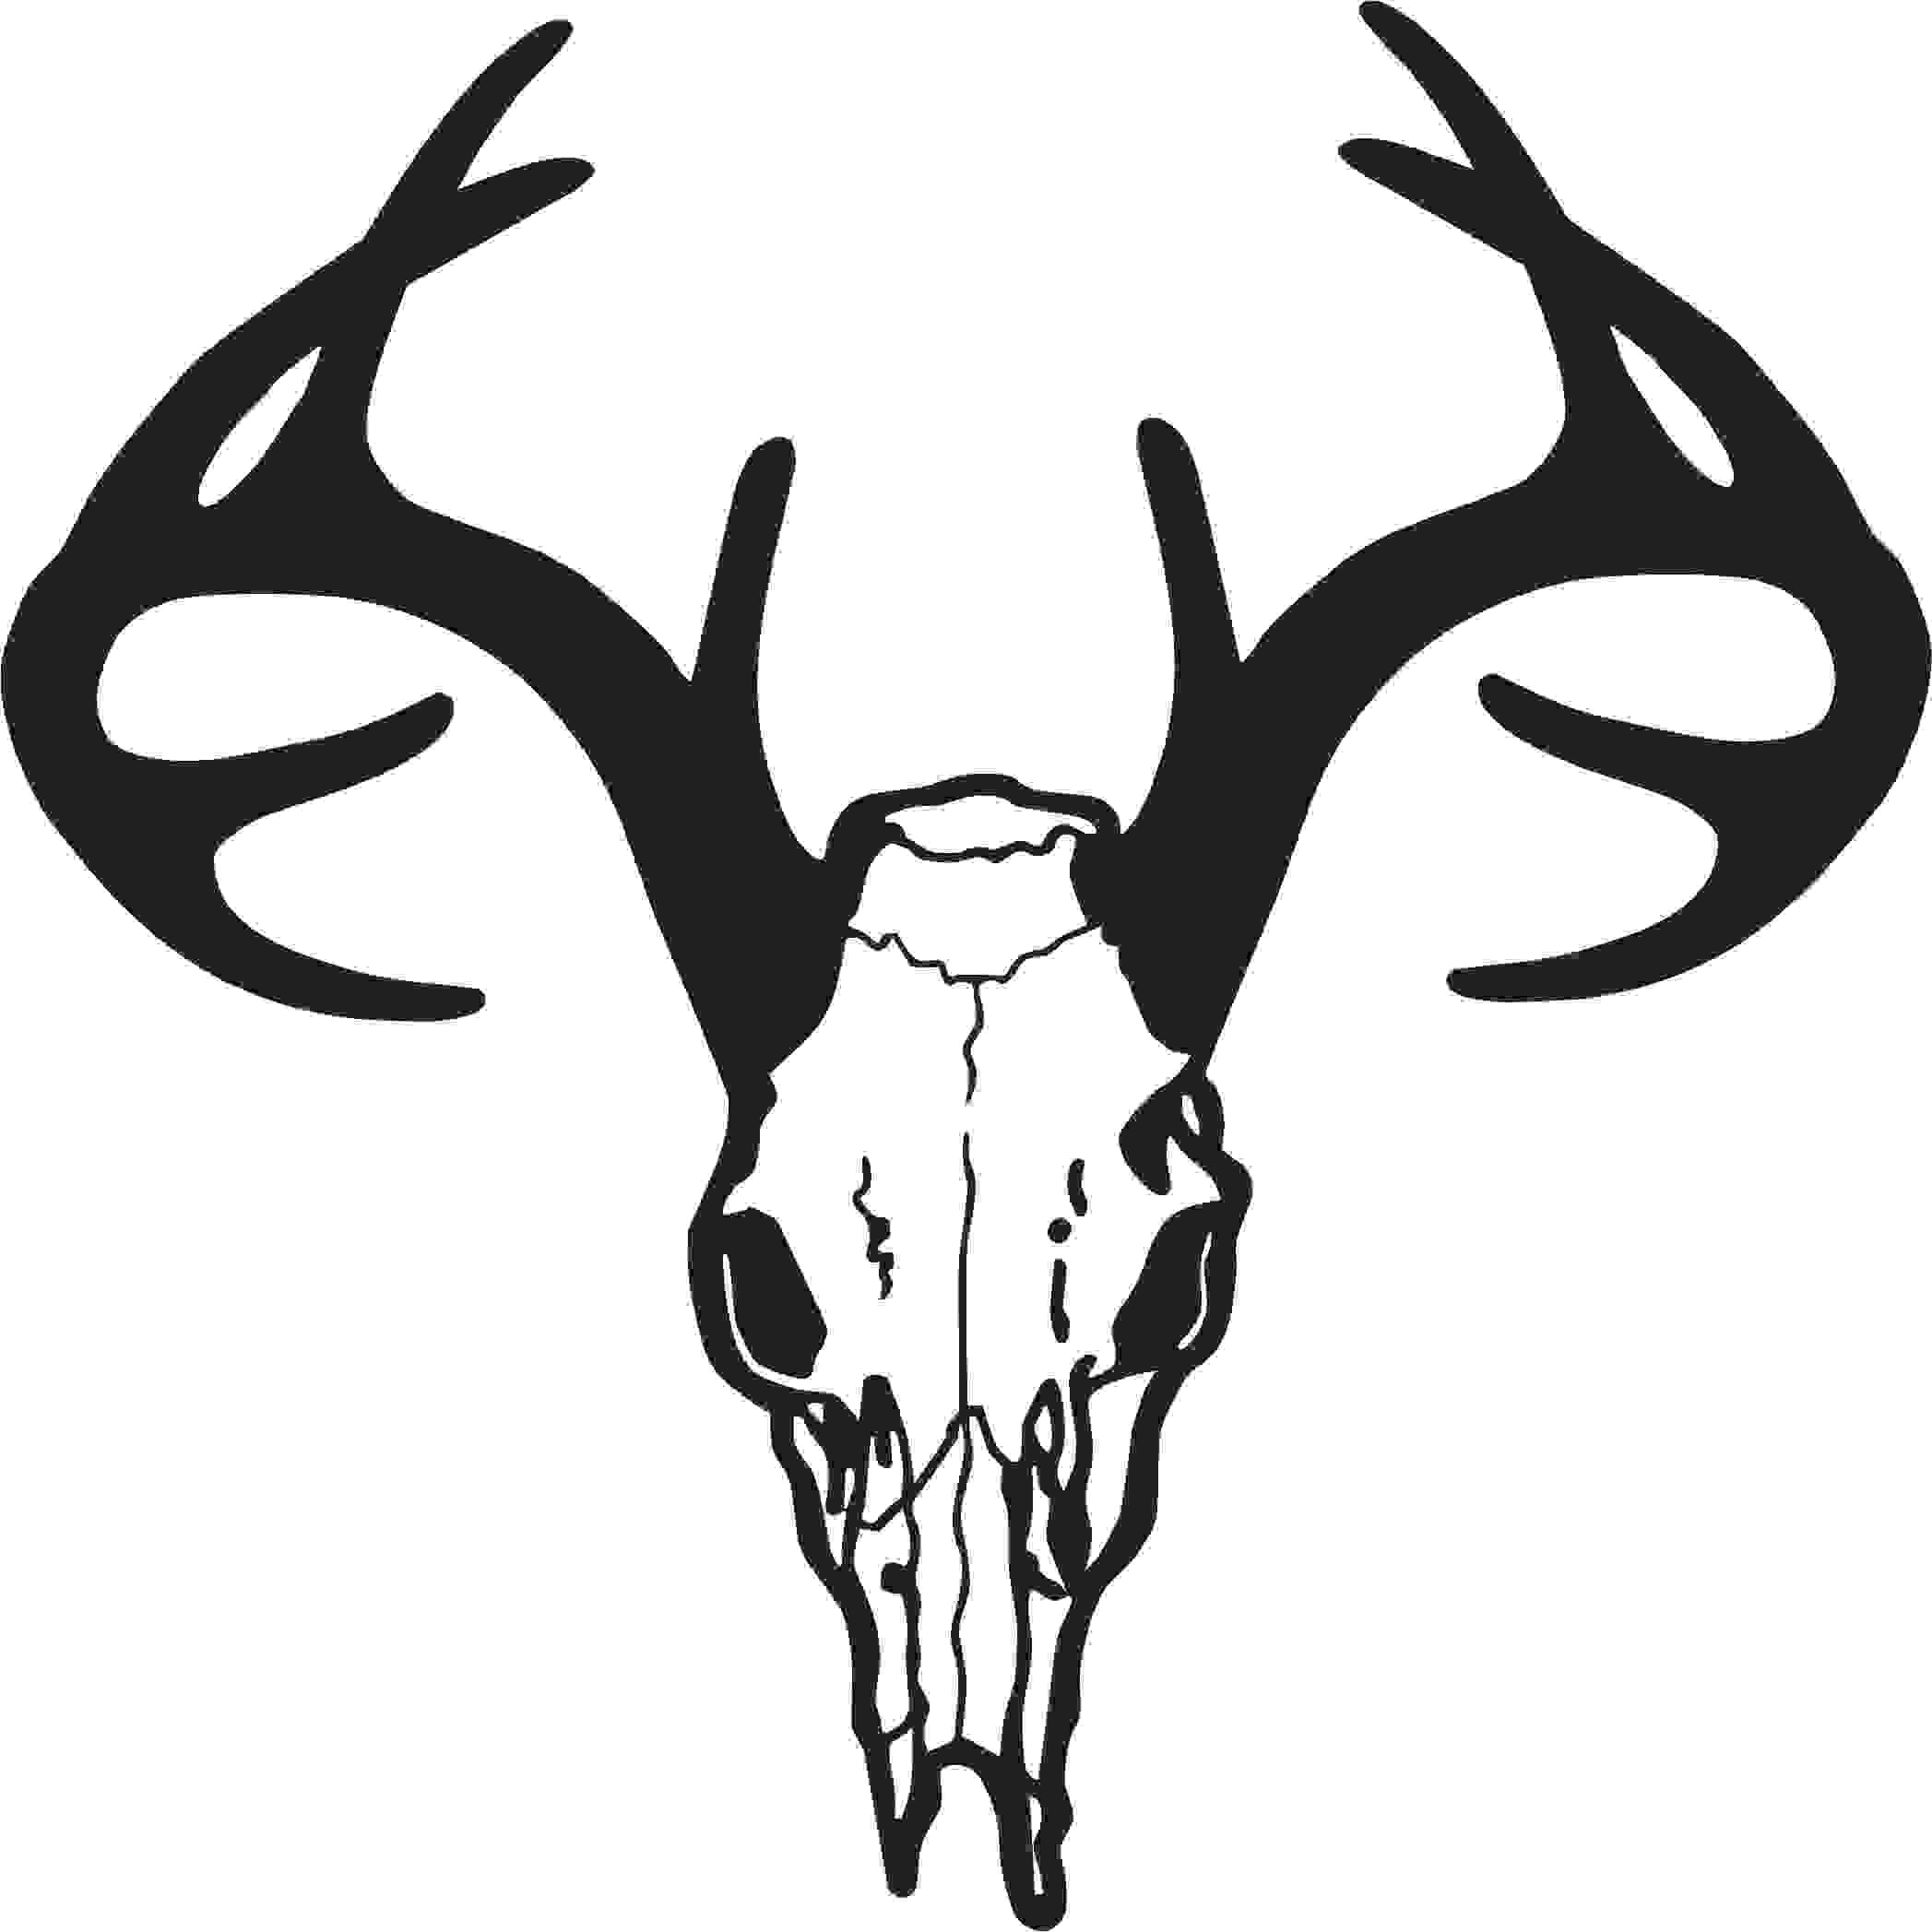 Deer Skull Clipart | Clipart Panda - Free Clipart Images